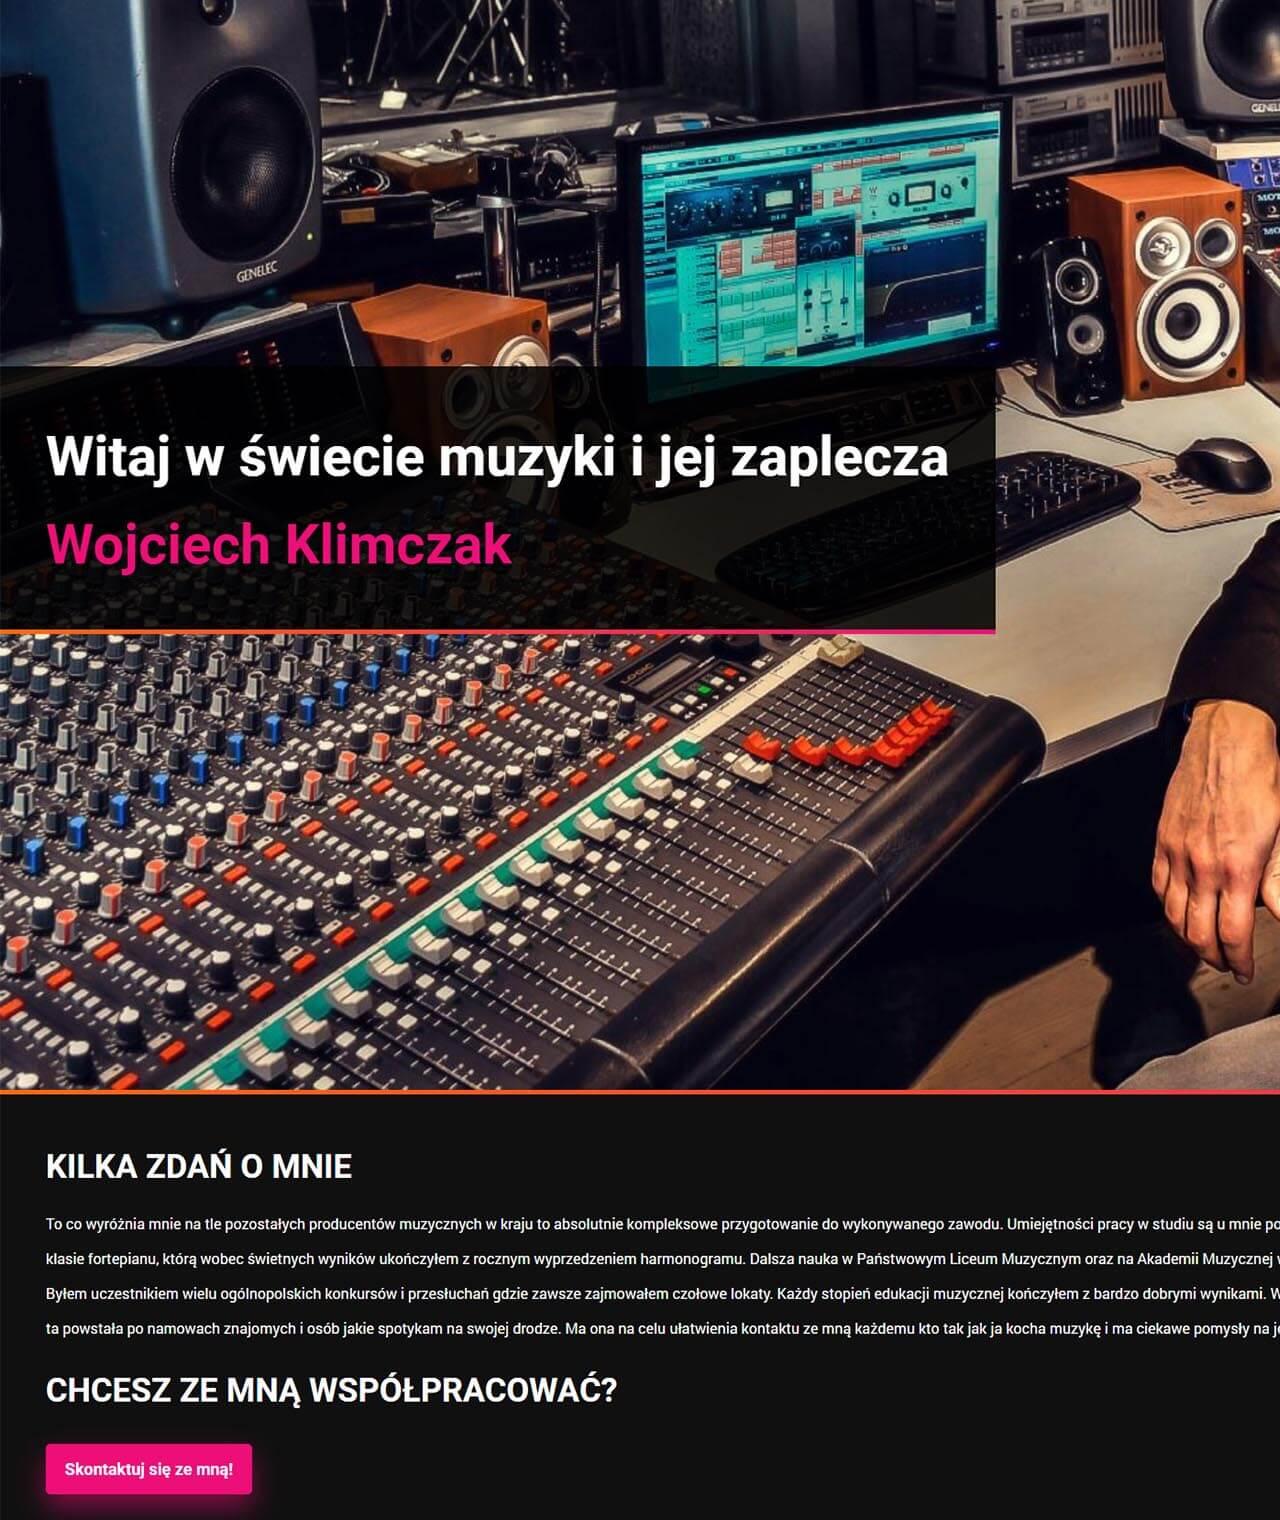 Strona producentmuzyczny.pl